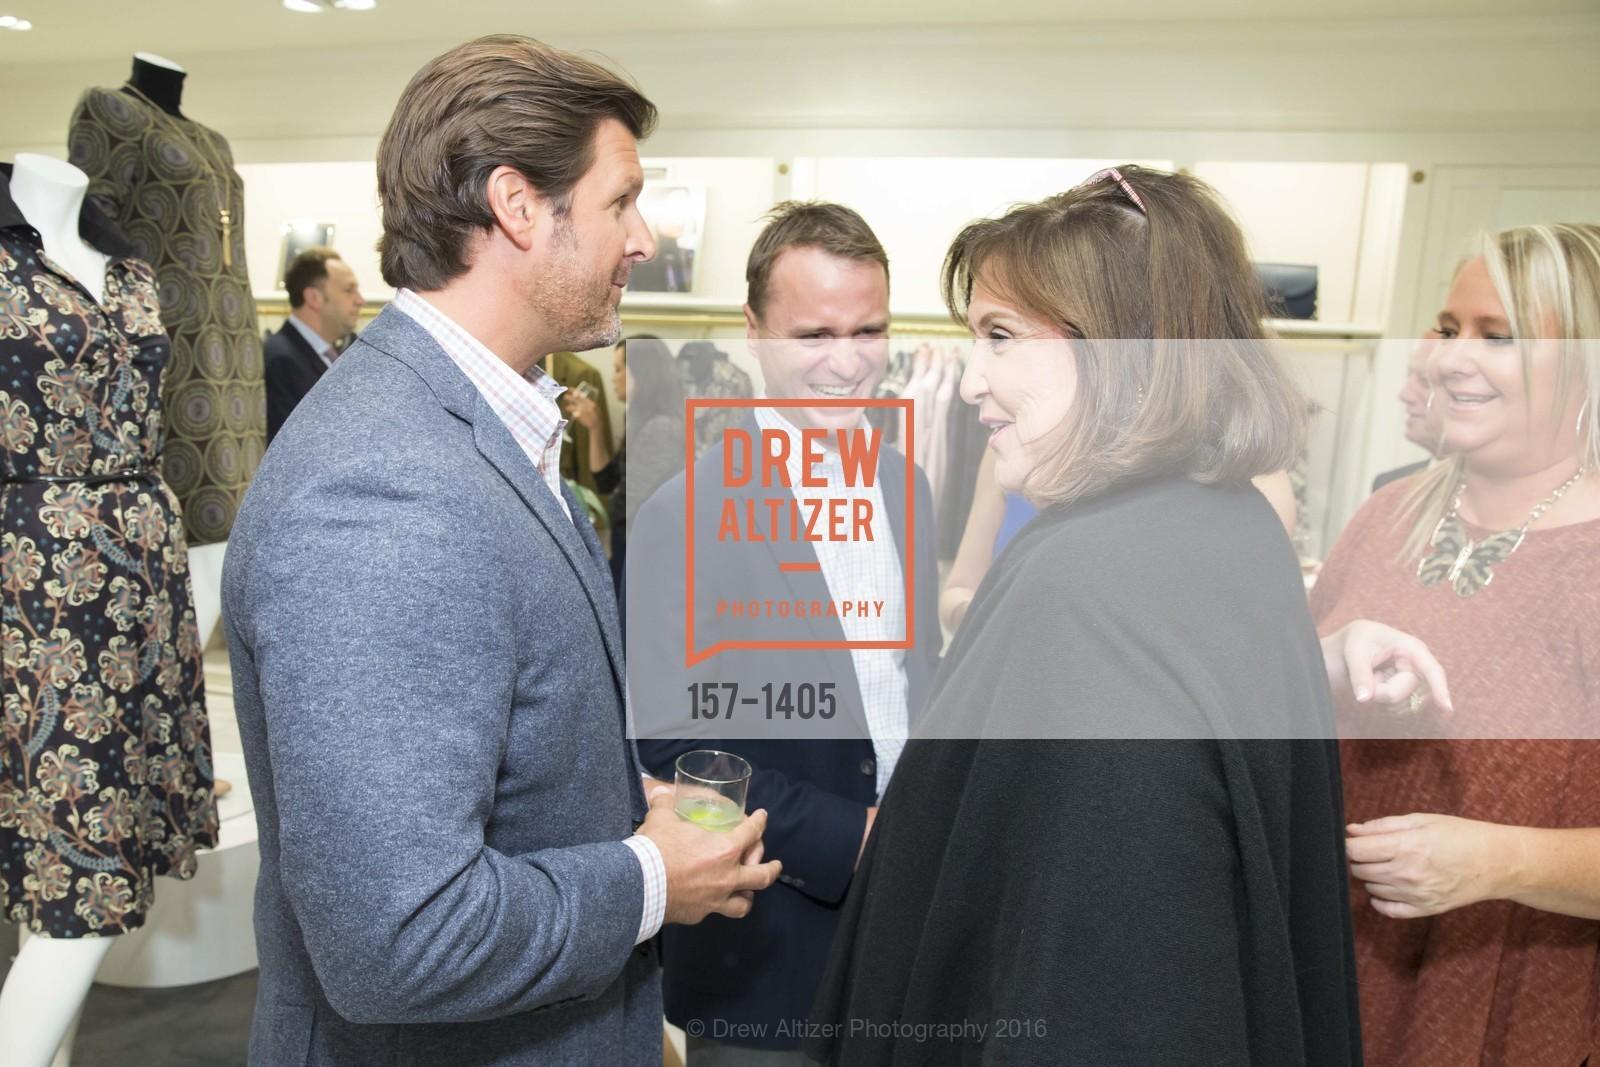 Matthew Cook, Debbie Magowan, Lori Puccinelli Stern, Photo #157-1405